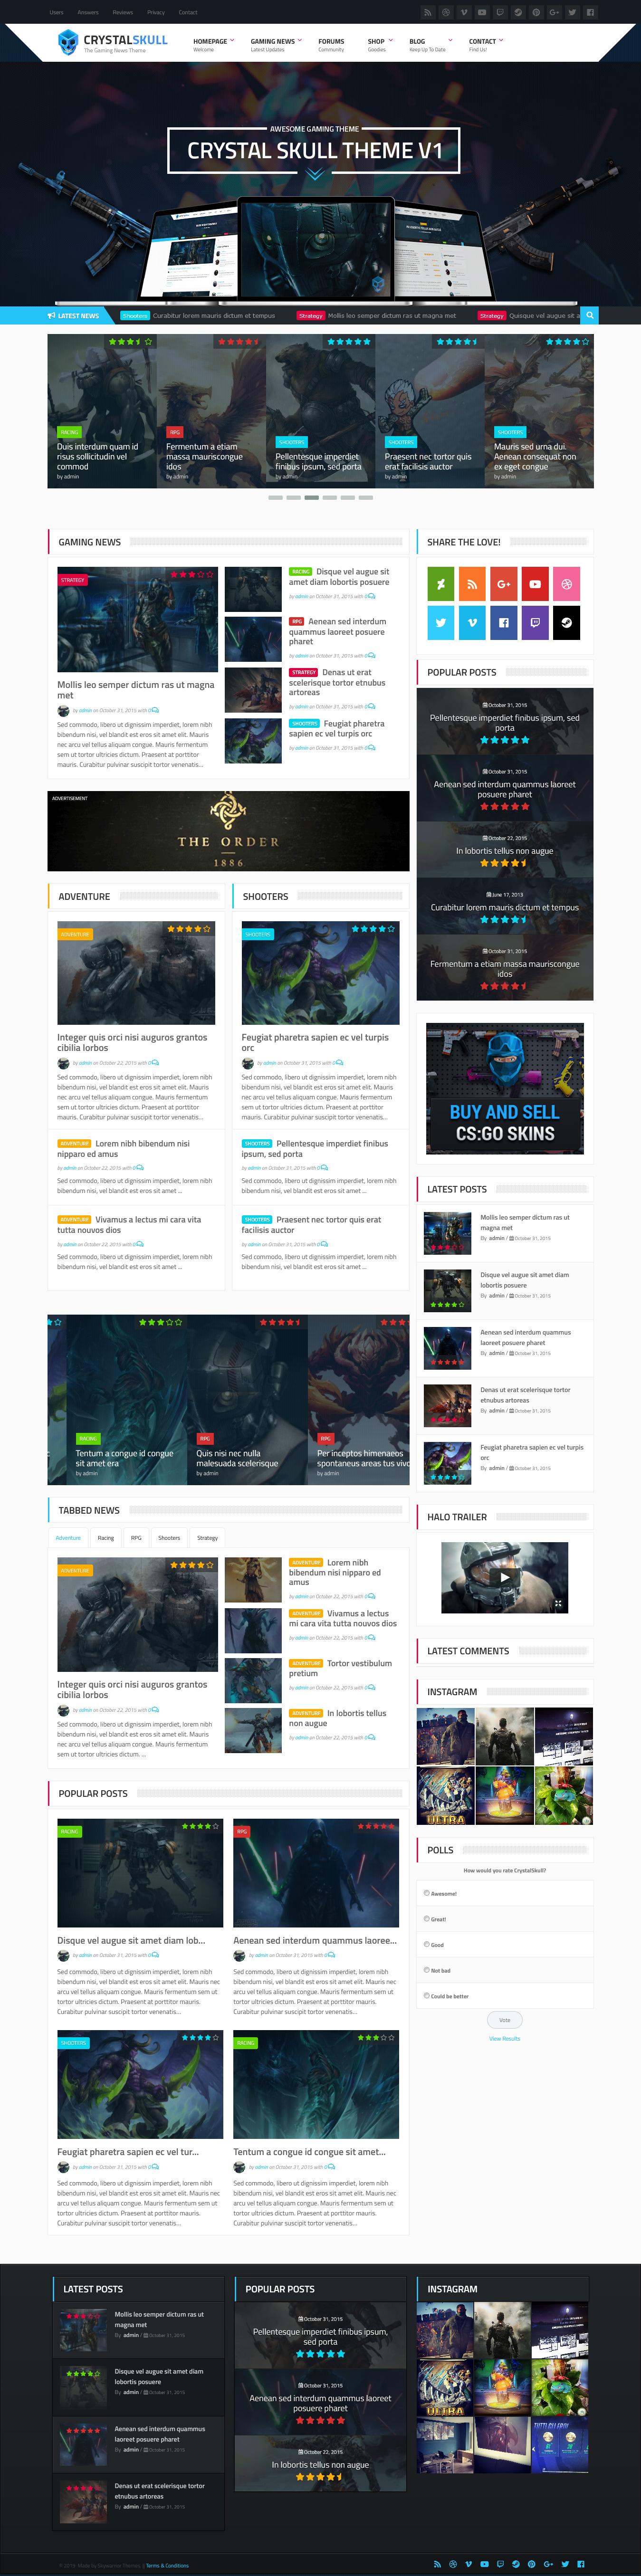 CrystallSkull - Best Premium Gaming WordPress Theme